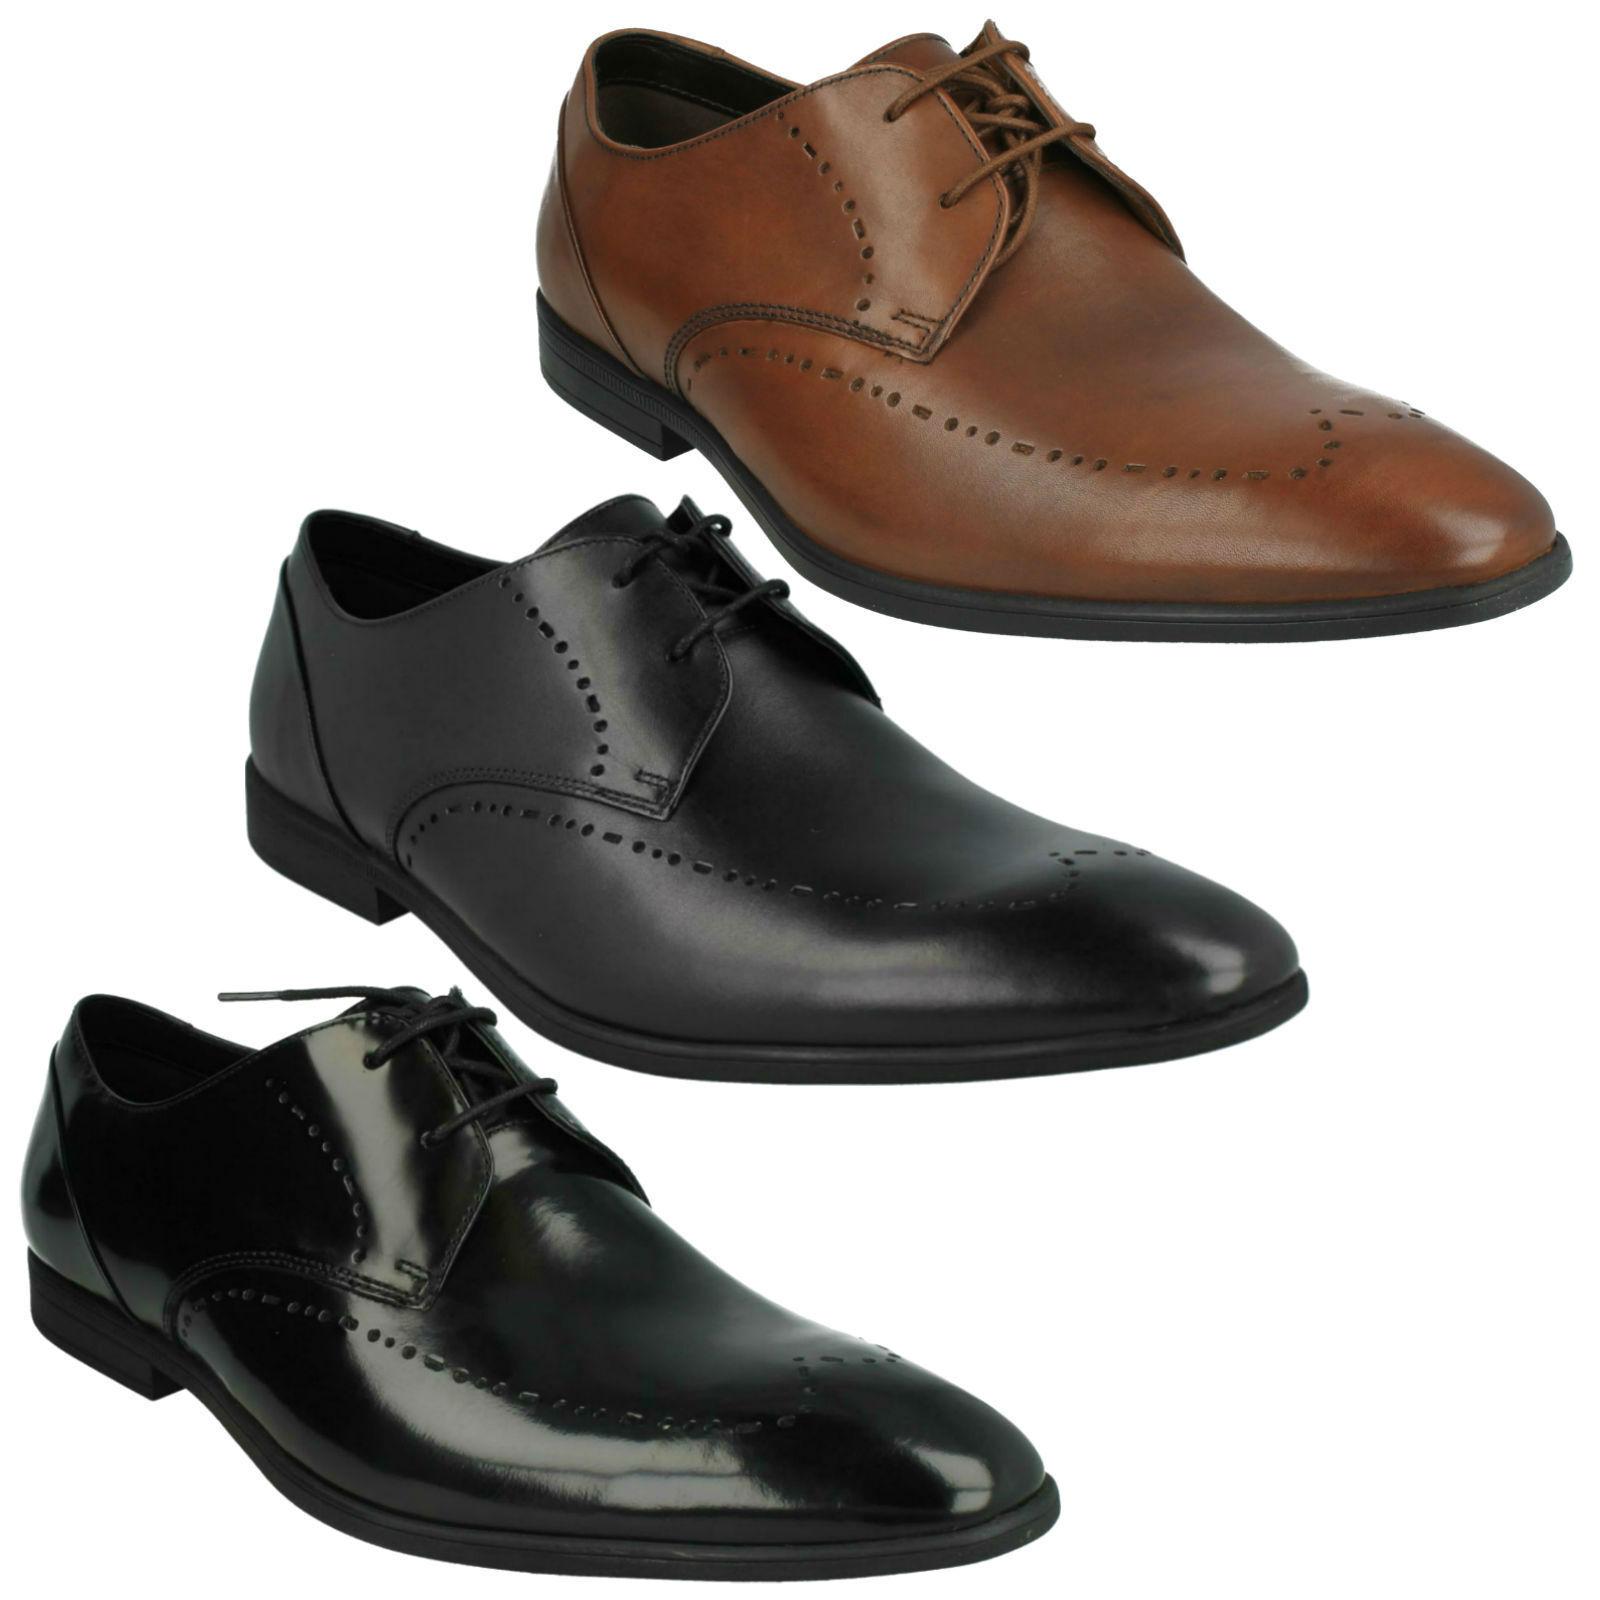 bampton LIMITE Clarks para Mujer Elegantes Cordones Cuero Boda Zapatos Oxford